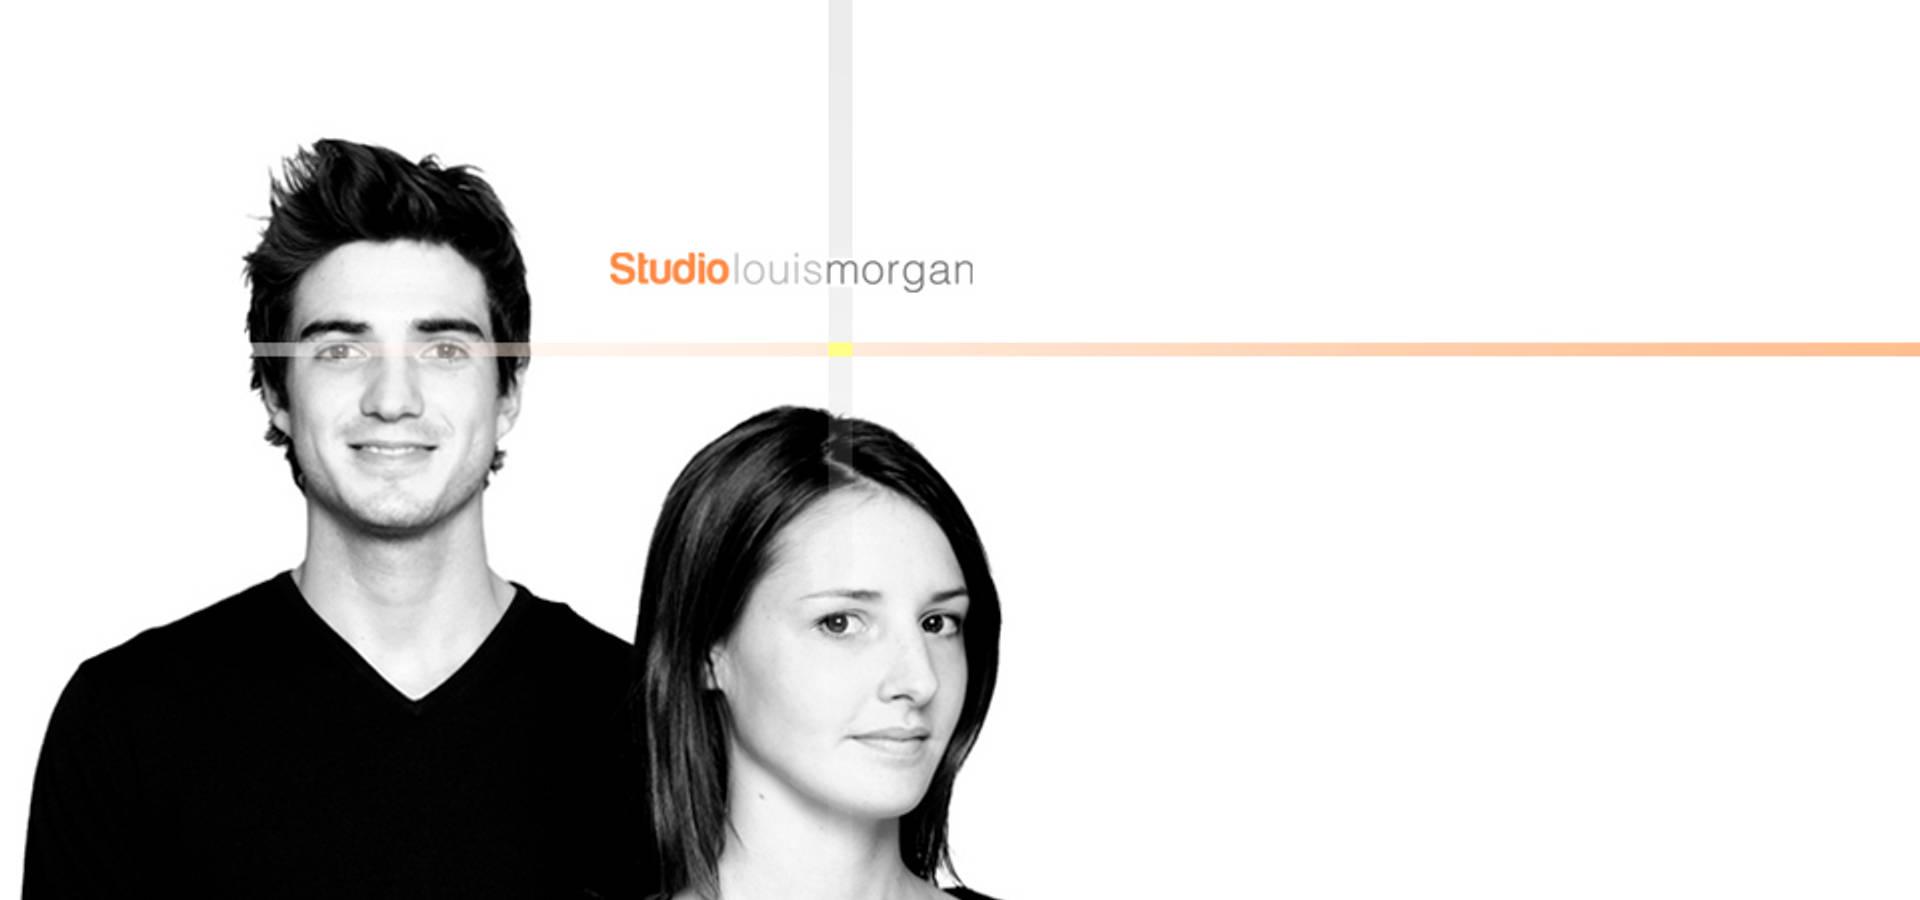 Studio Louis morgan